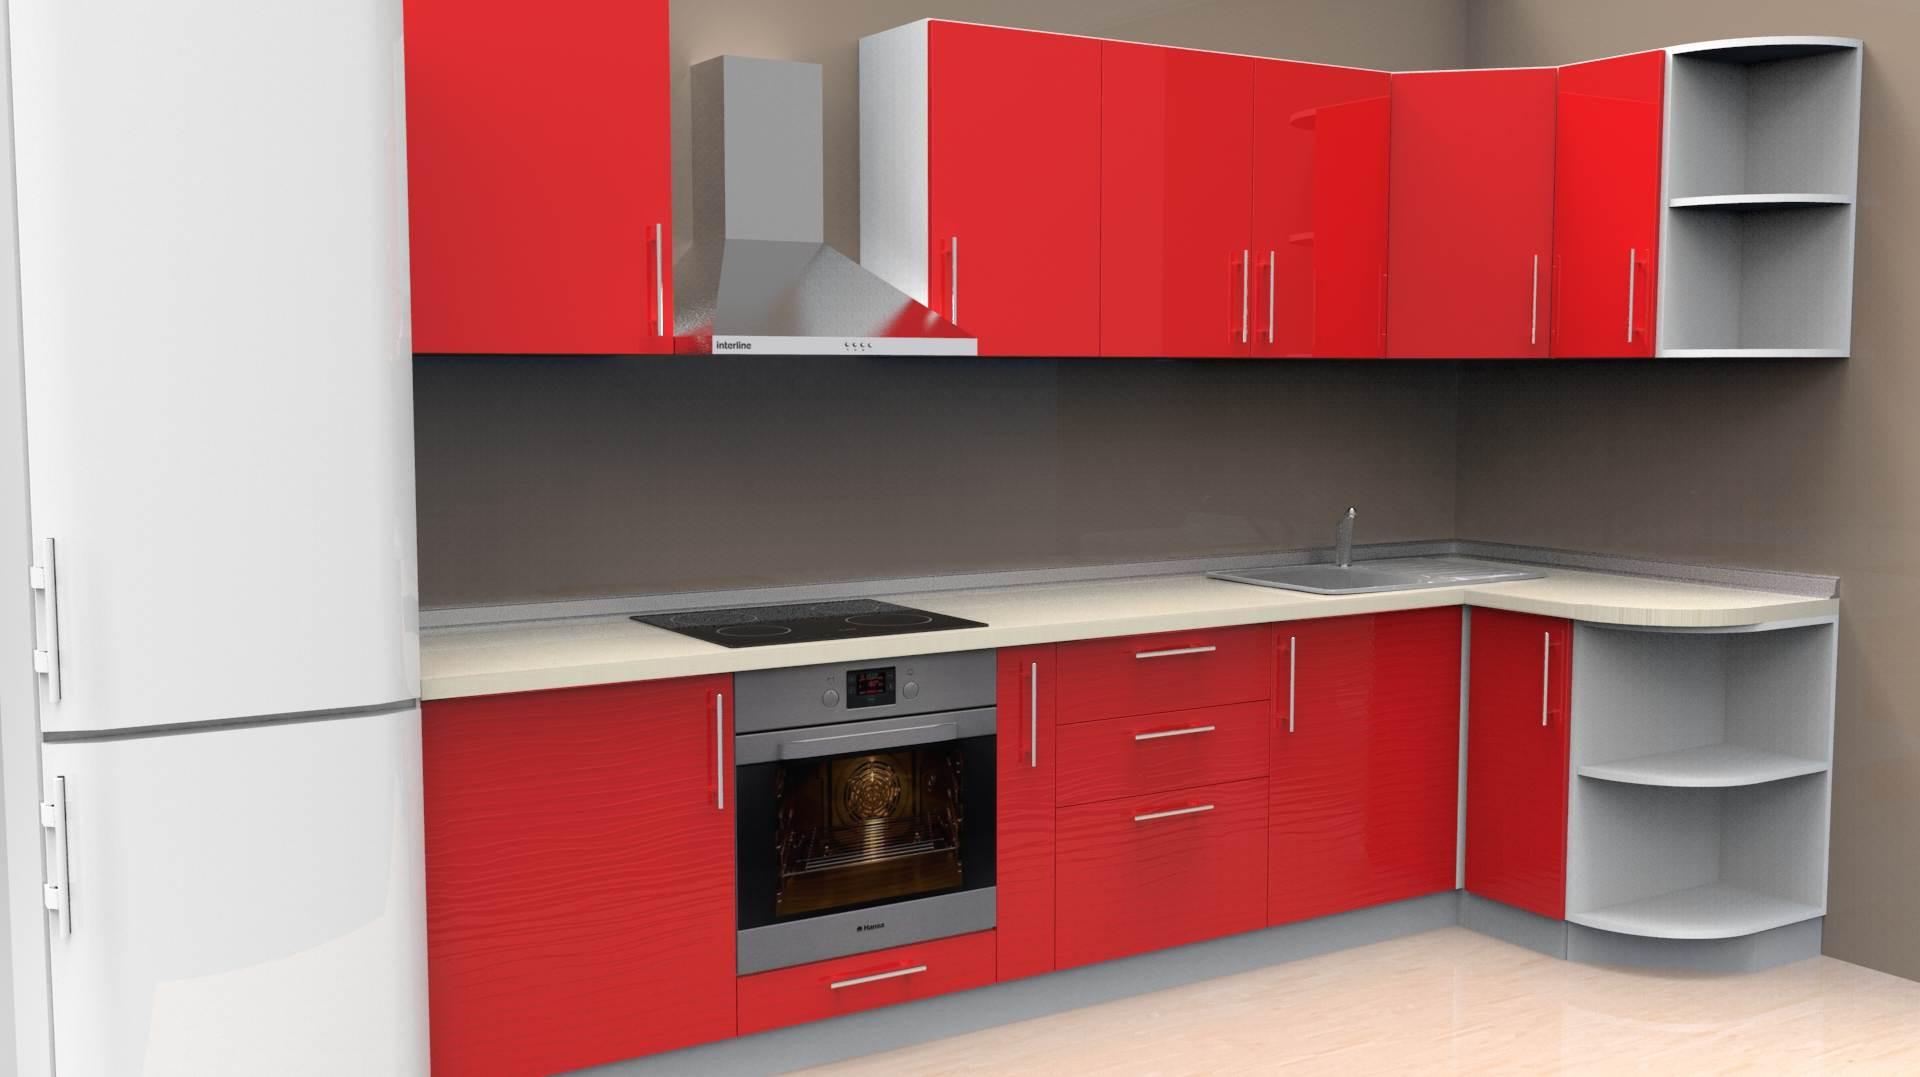 Kitchen Cabinet Designing Software  10 Free Cabinet Design Software and Paid Tools to Design